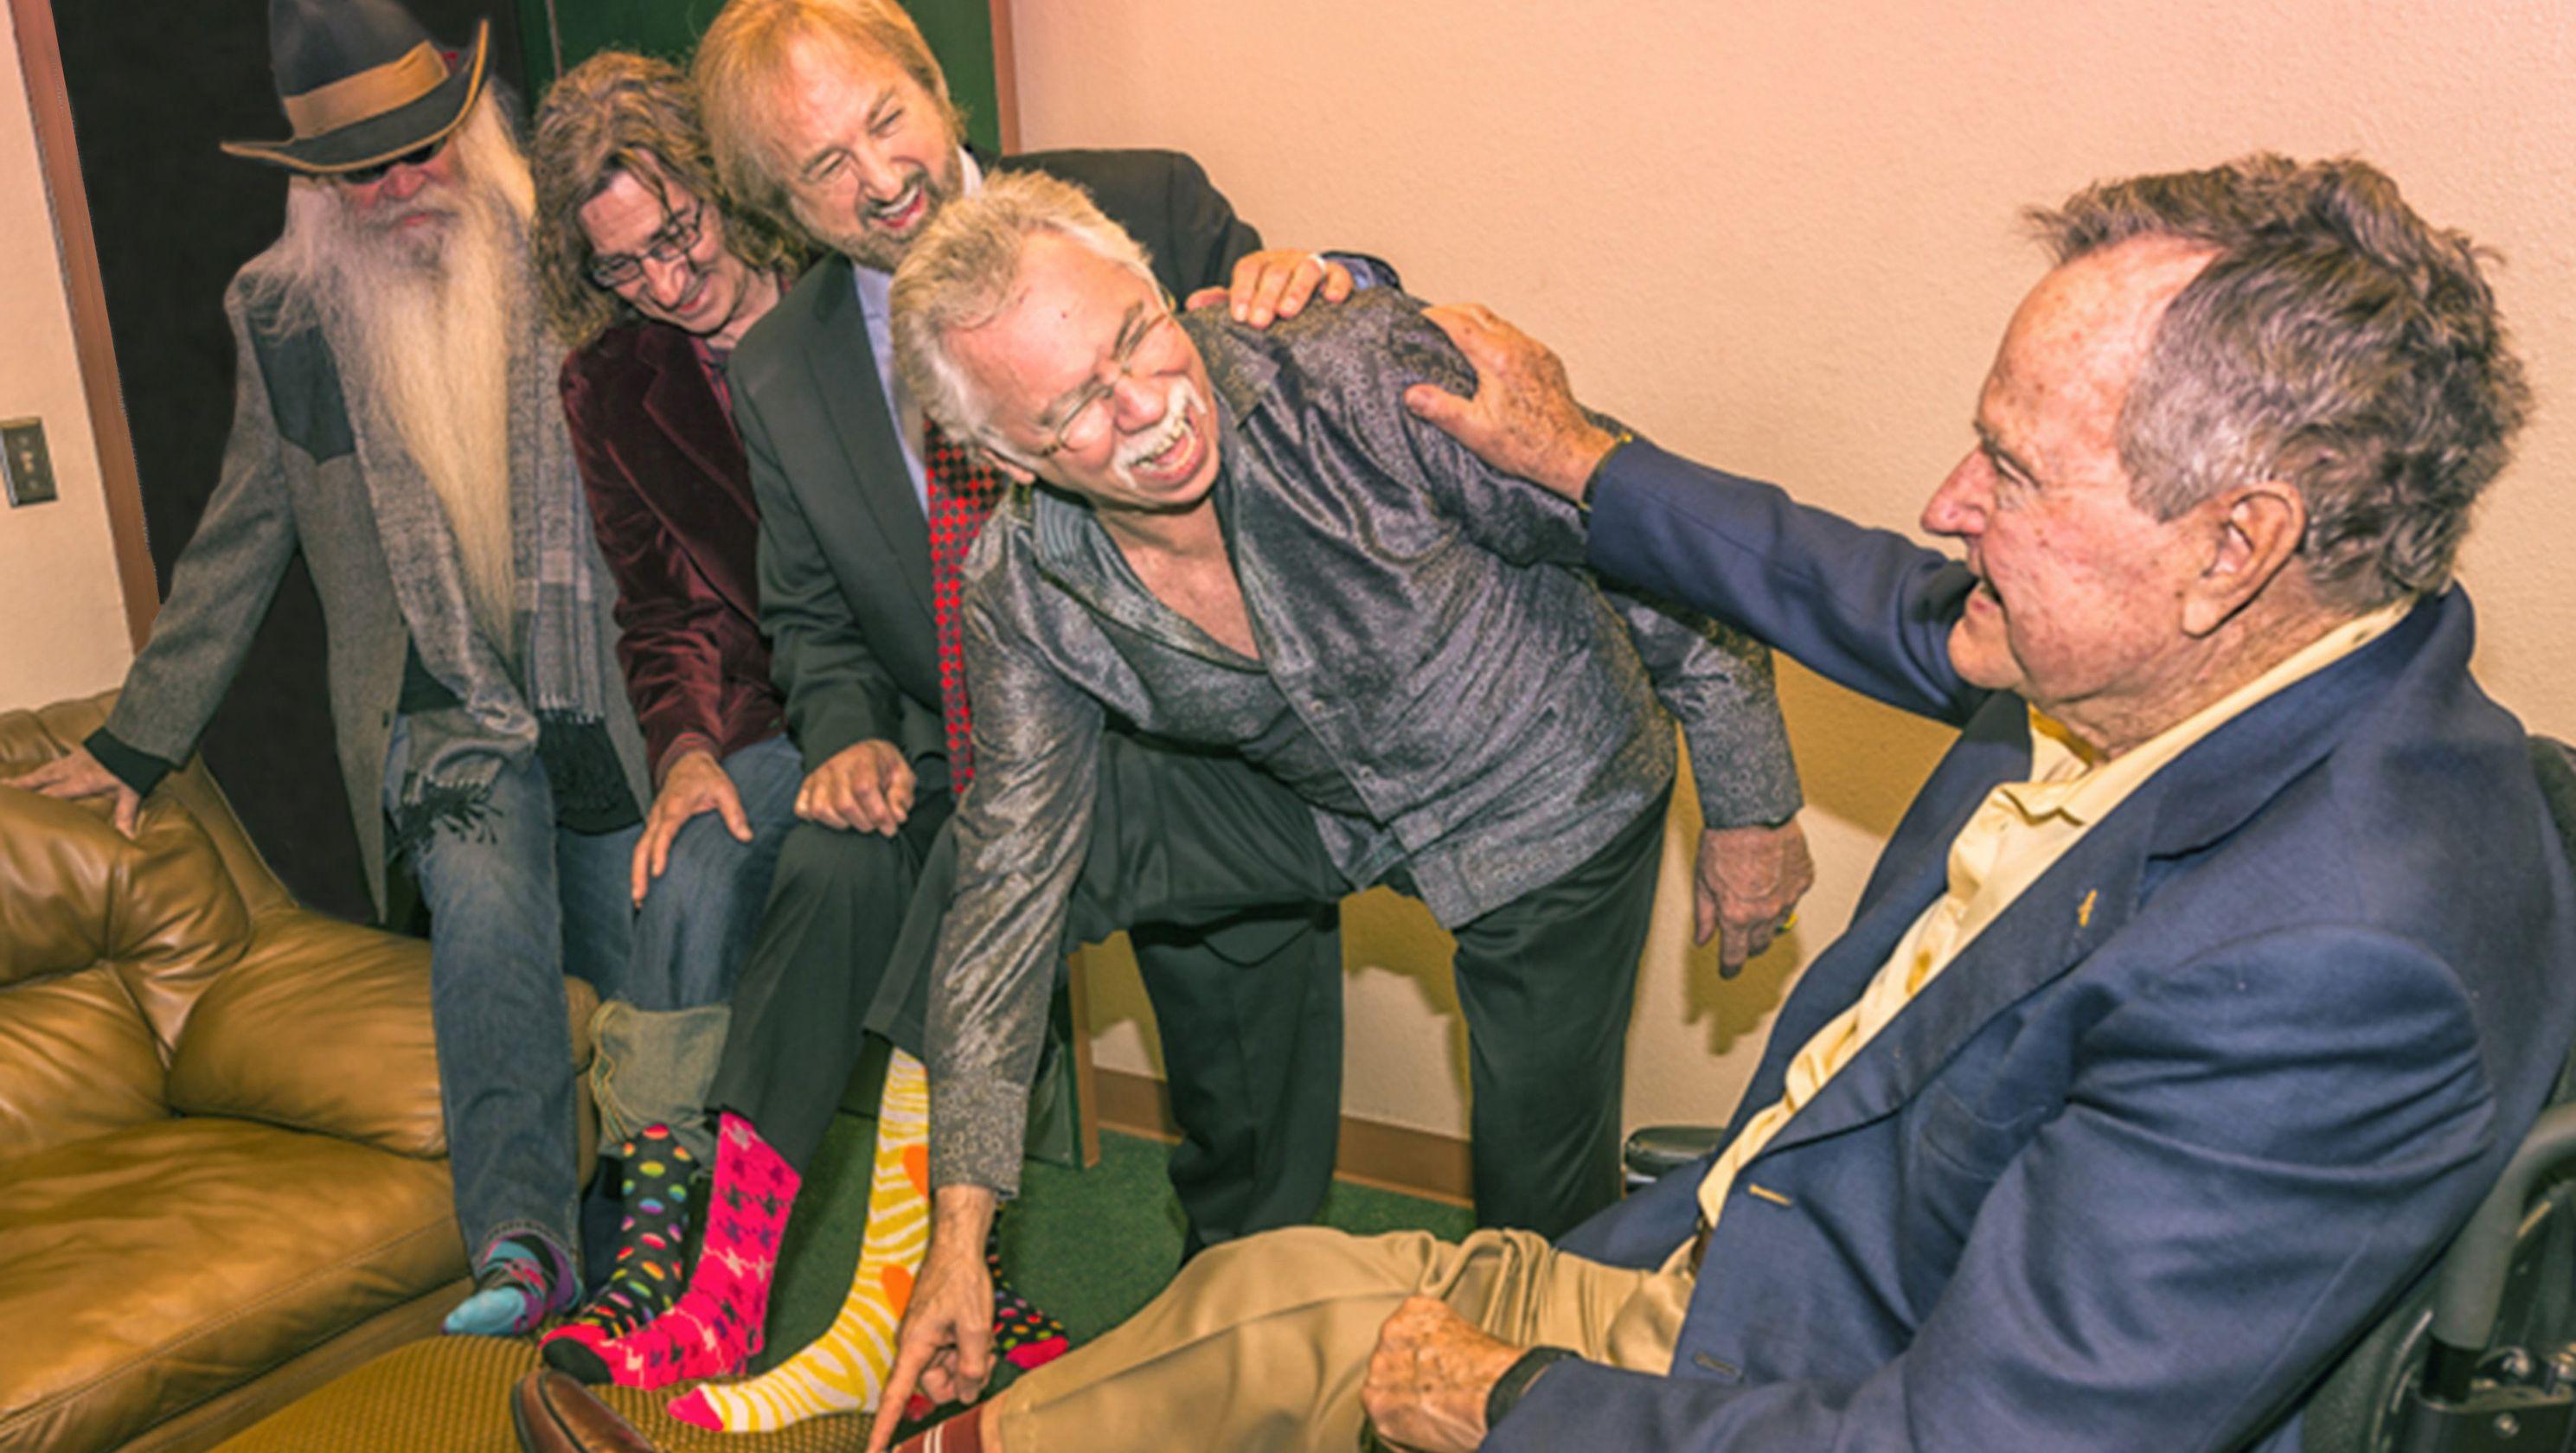 Oak Ridge Boys kept solemn promise to George H.W. Bush: 'It's what you do for friends'